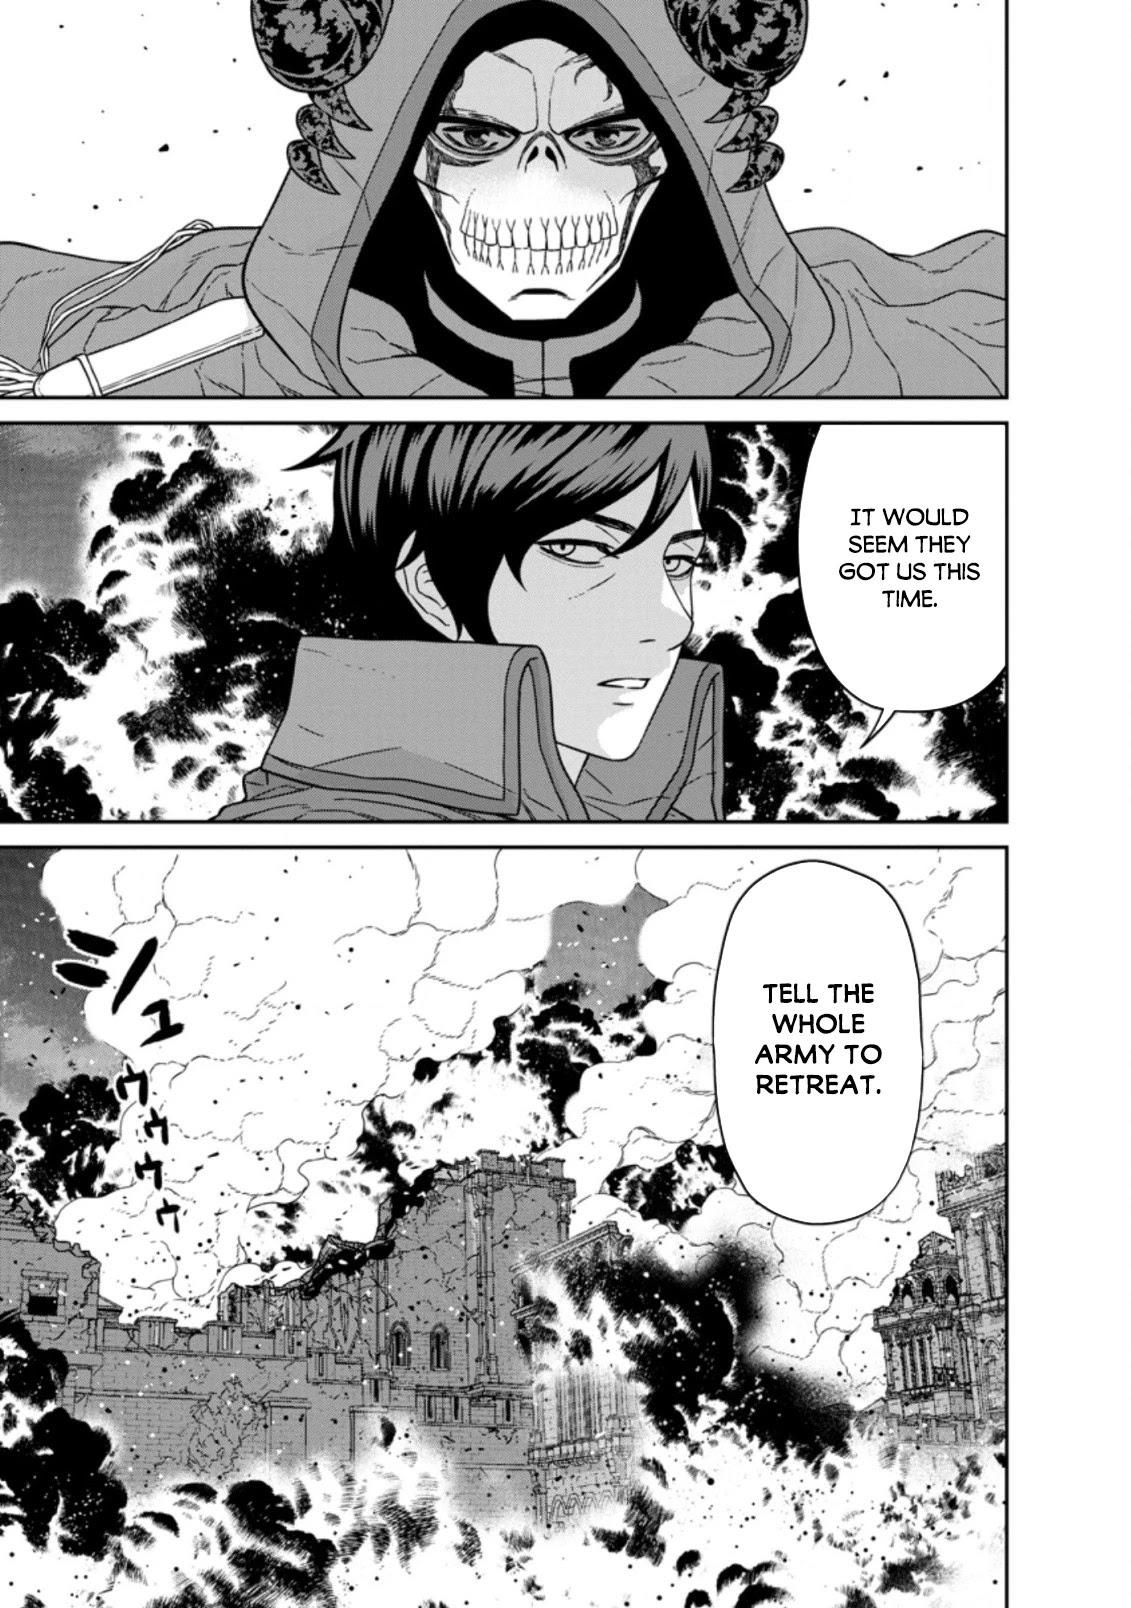 Maou Gun Saikyou No Majutsushi Wa Ningen Datta Chapter 19.1 page 4 - Mangakakalots.com